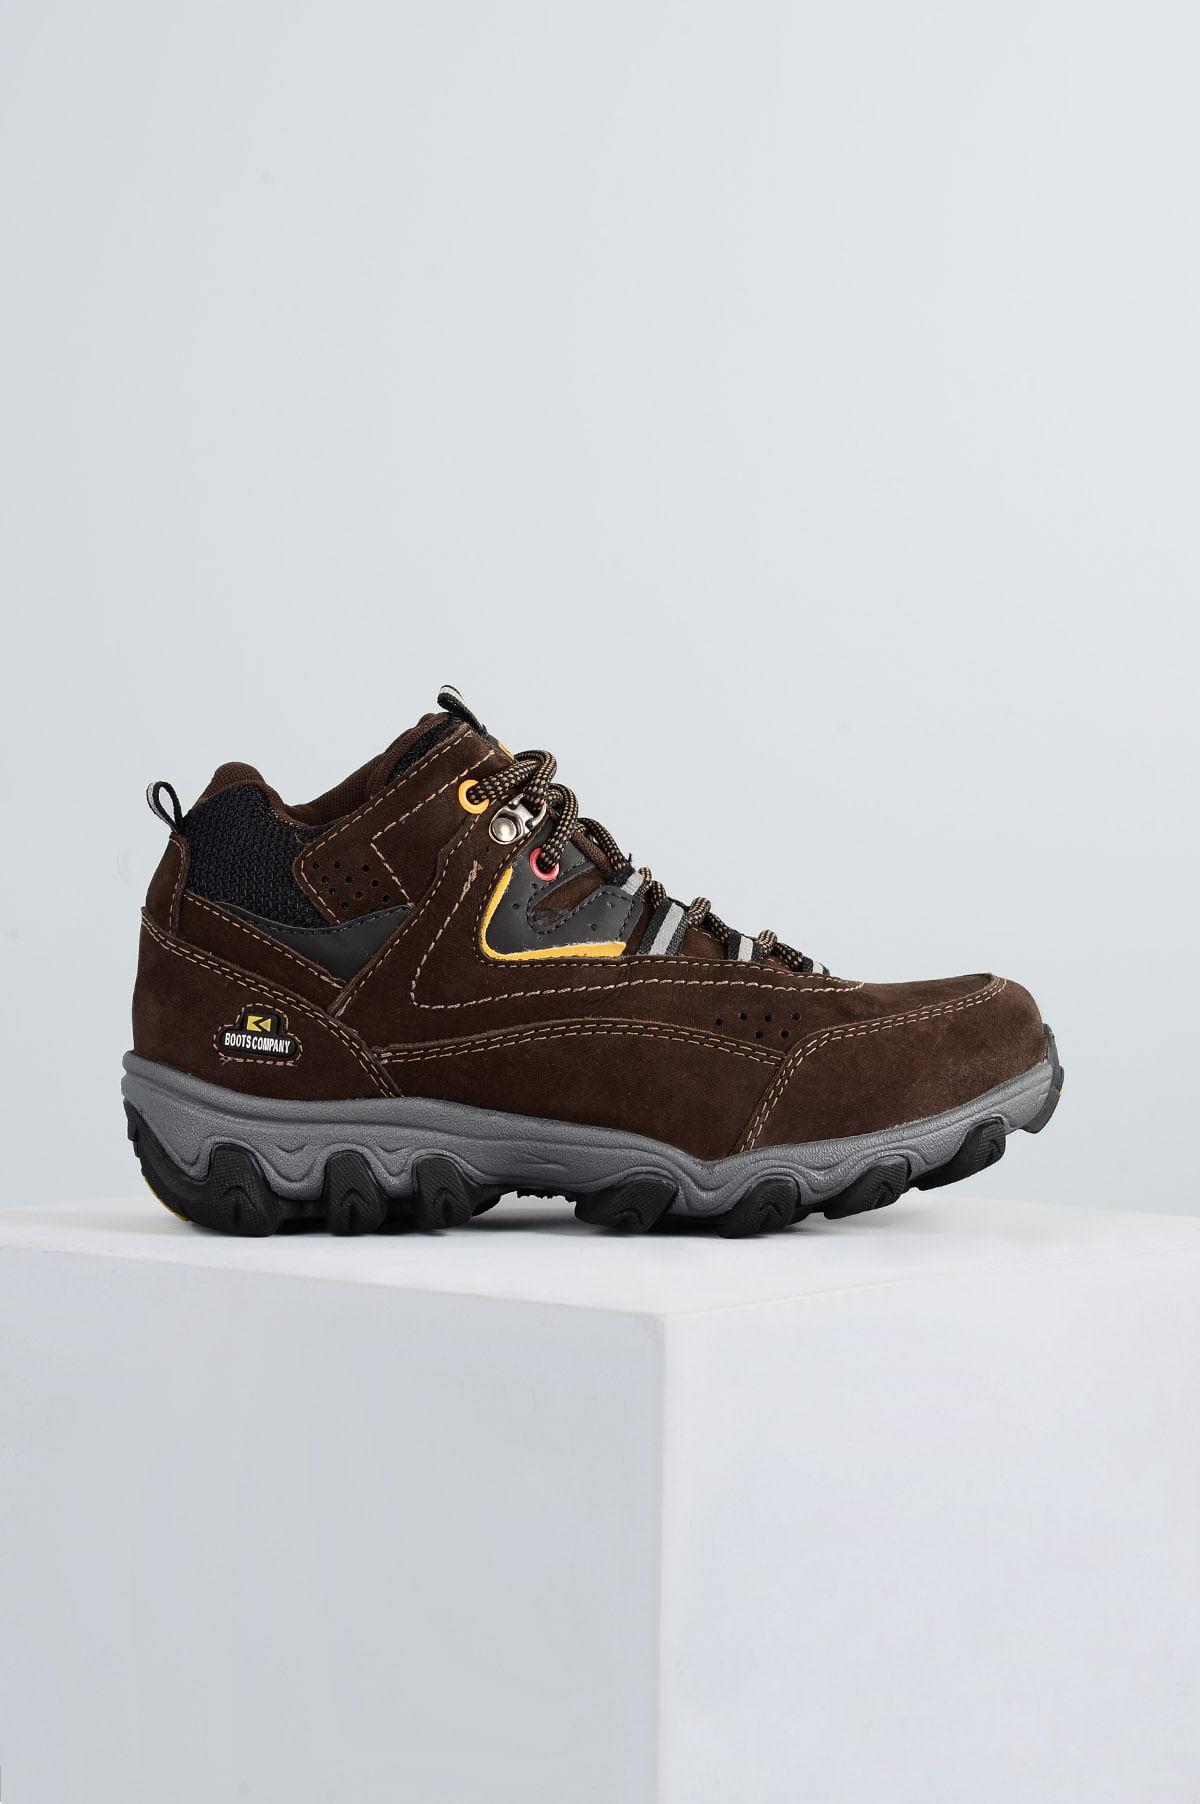 d75efaf862a Bota Masculina Boots Company Trainer XT CRAZY HORSE CAFE - Mundial ...